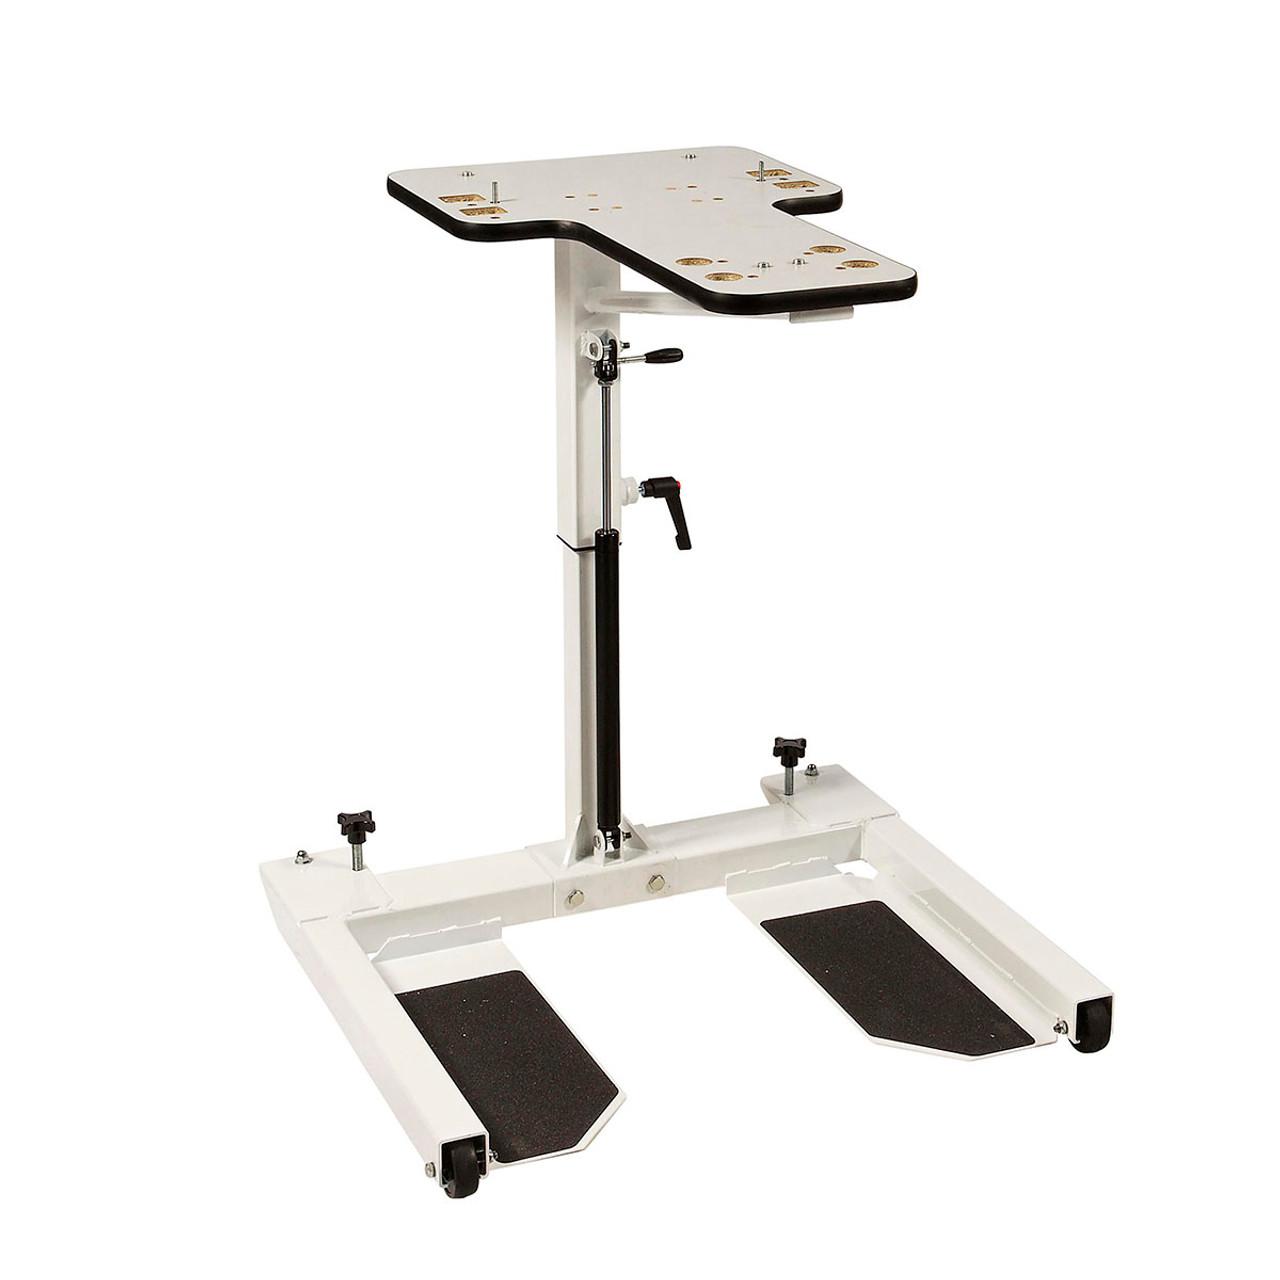 HCI PhysioTable Adjustable UBE Table